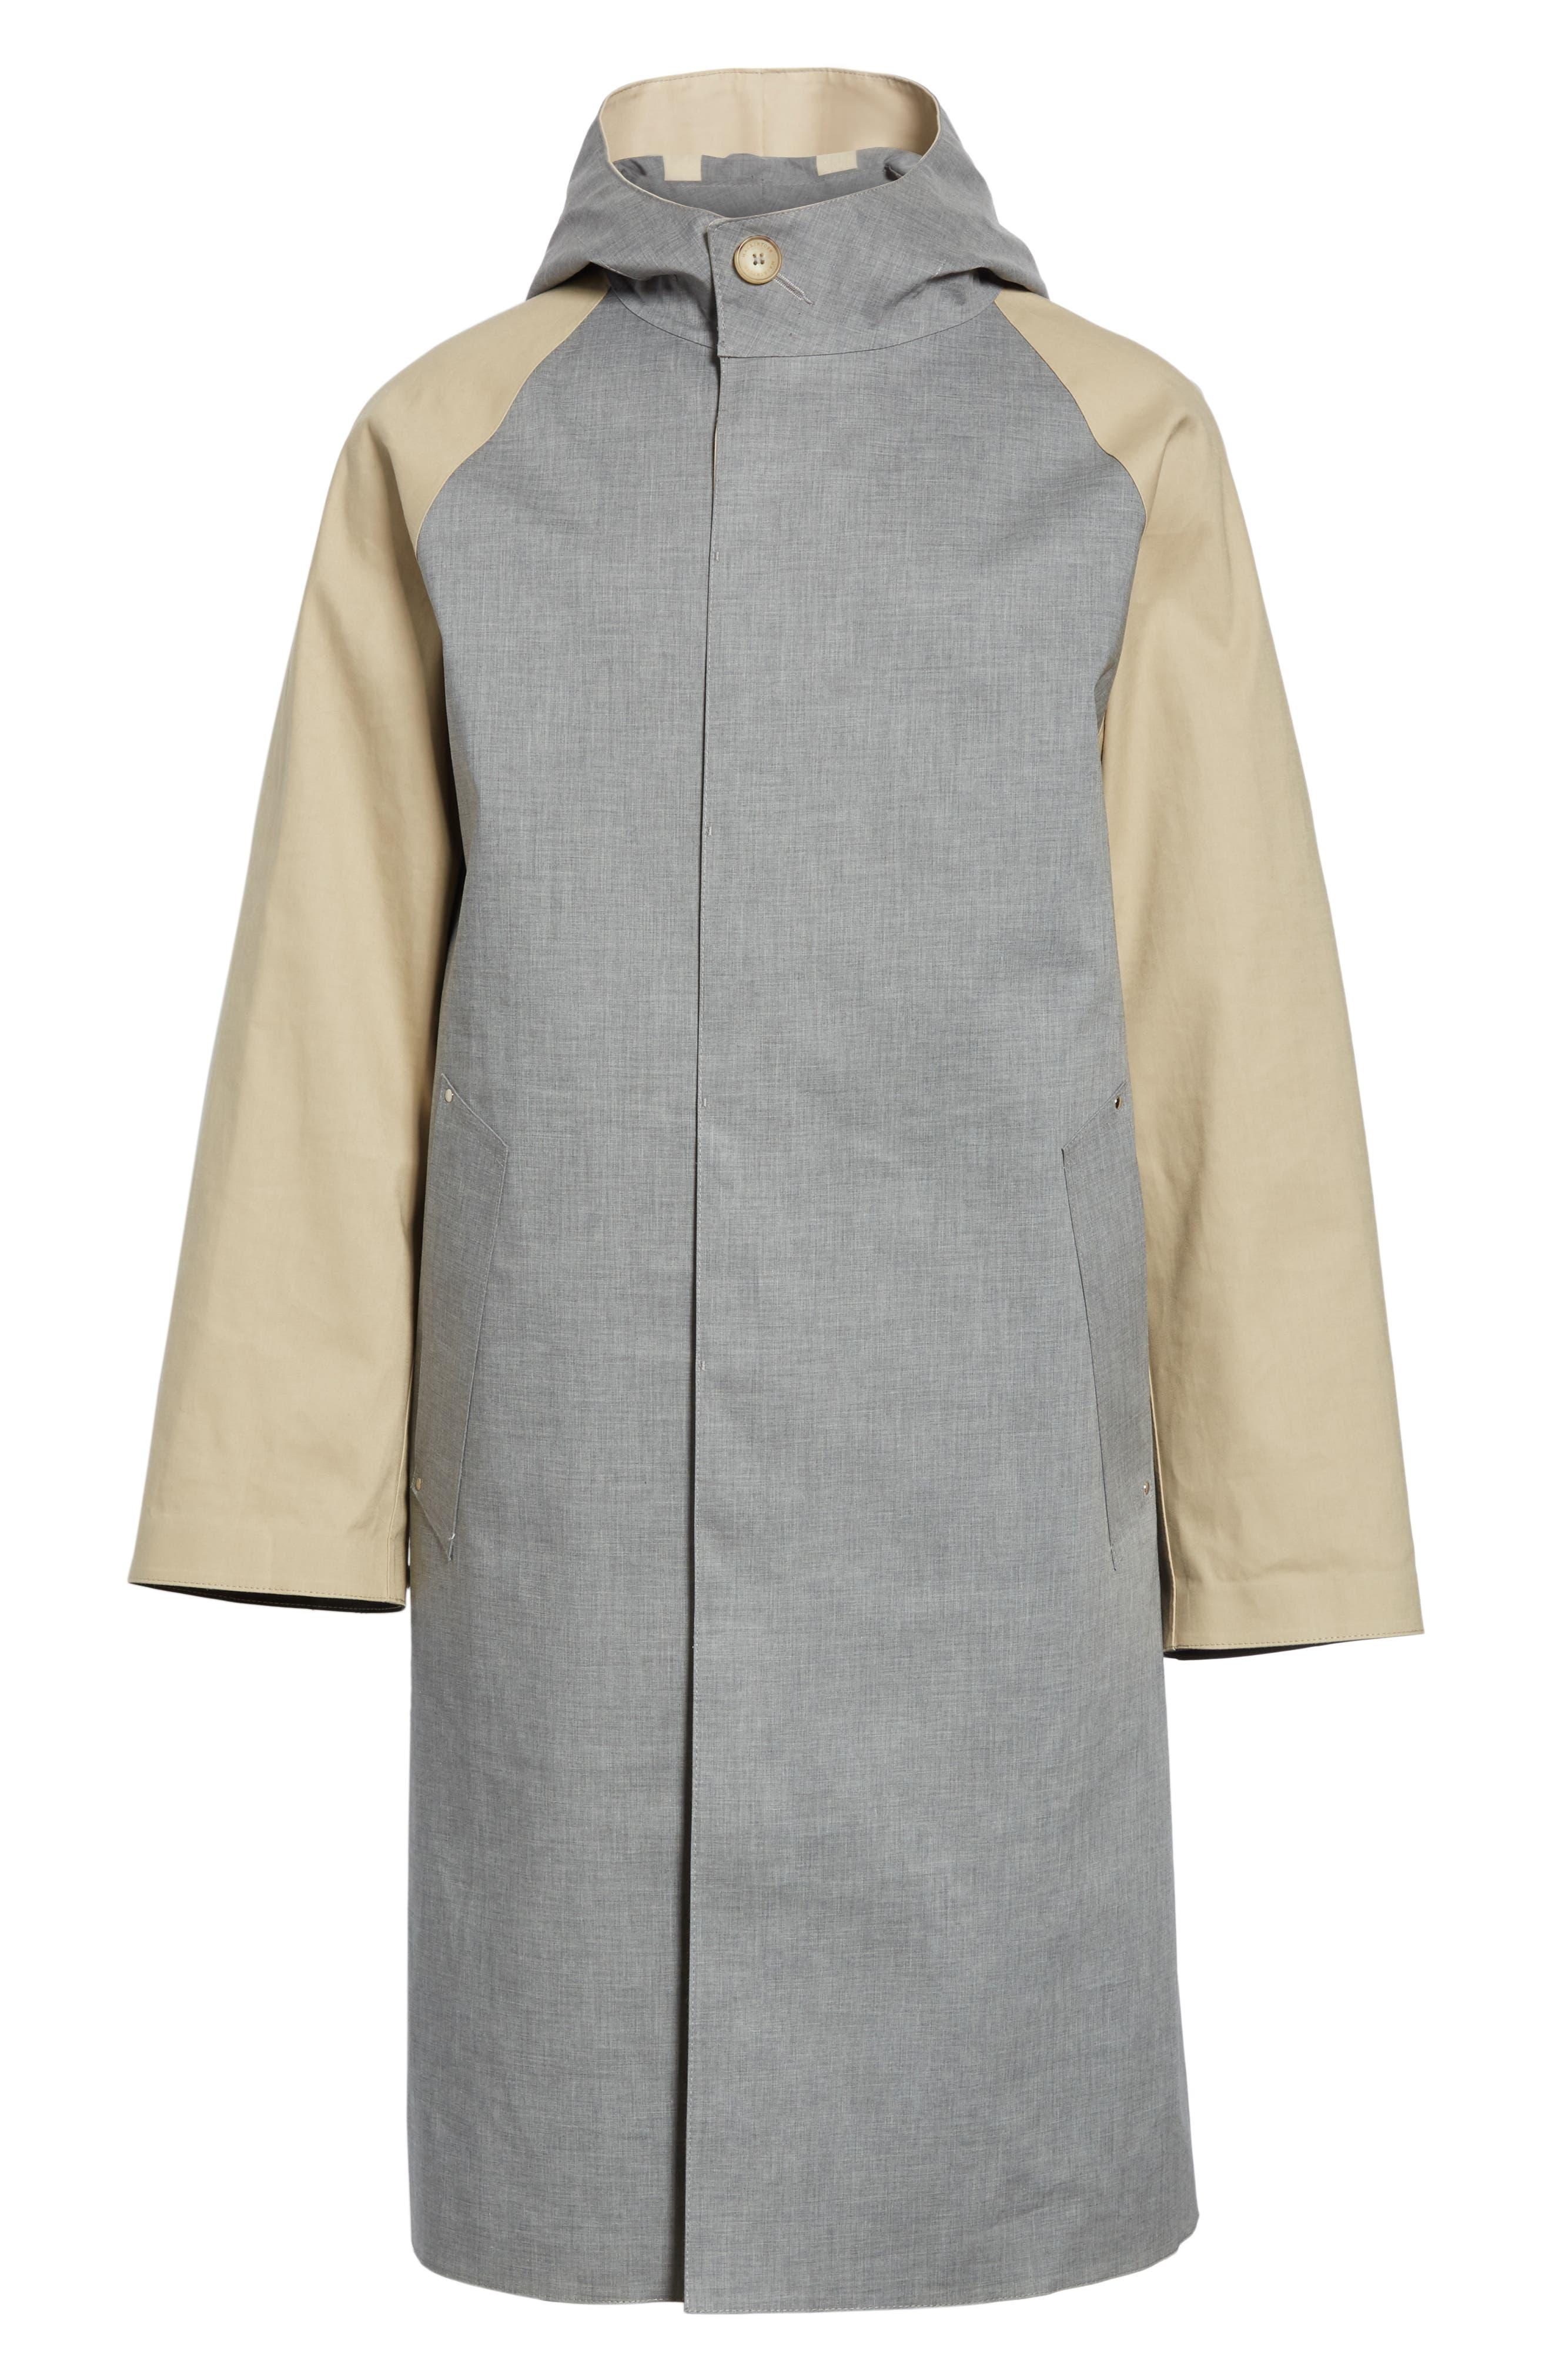 Bonded Cotton Hooded Jacket, Main, color, LIGHT TOP GREY/ INK